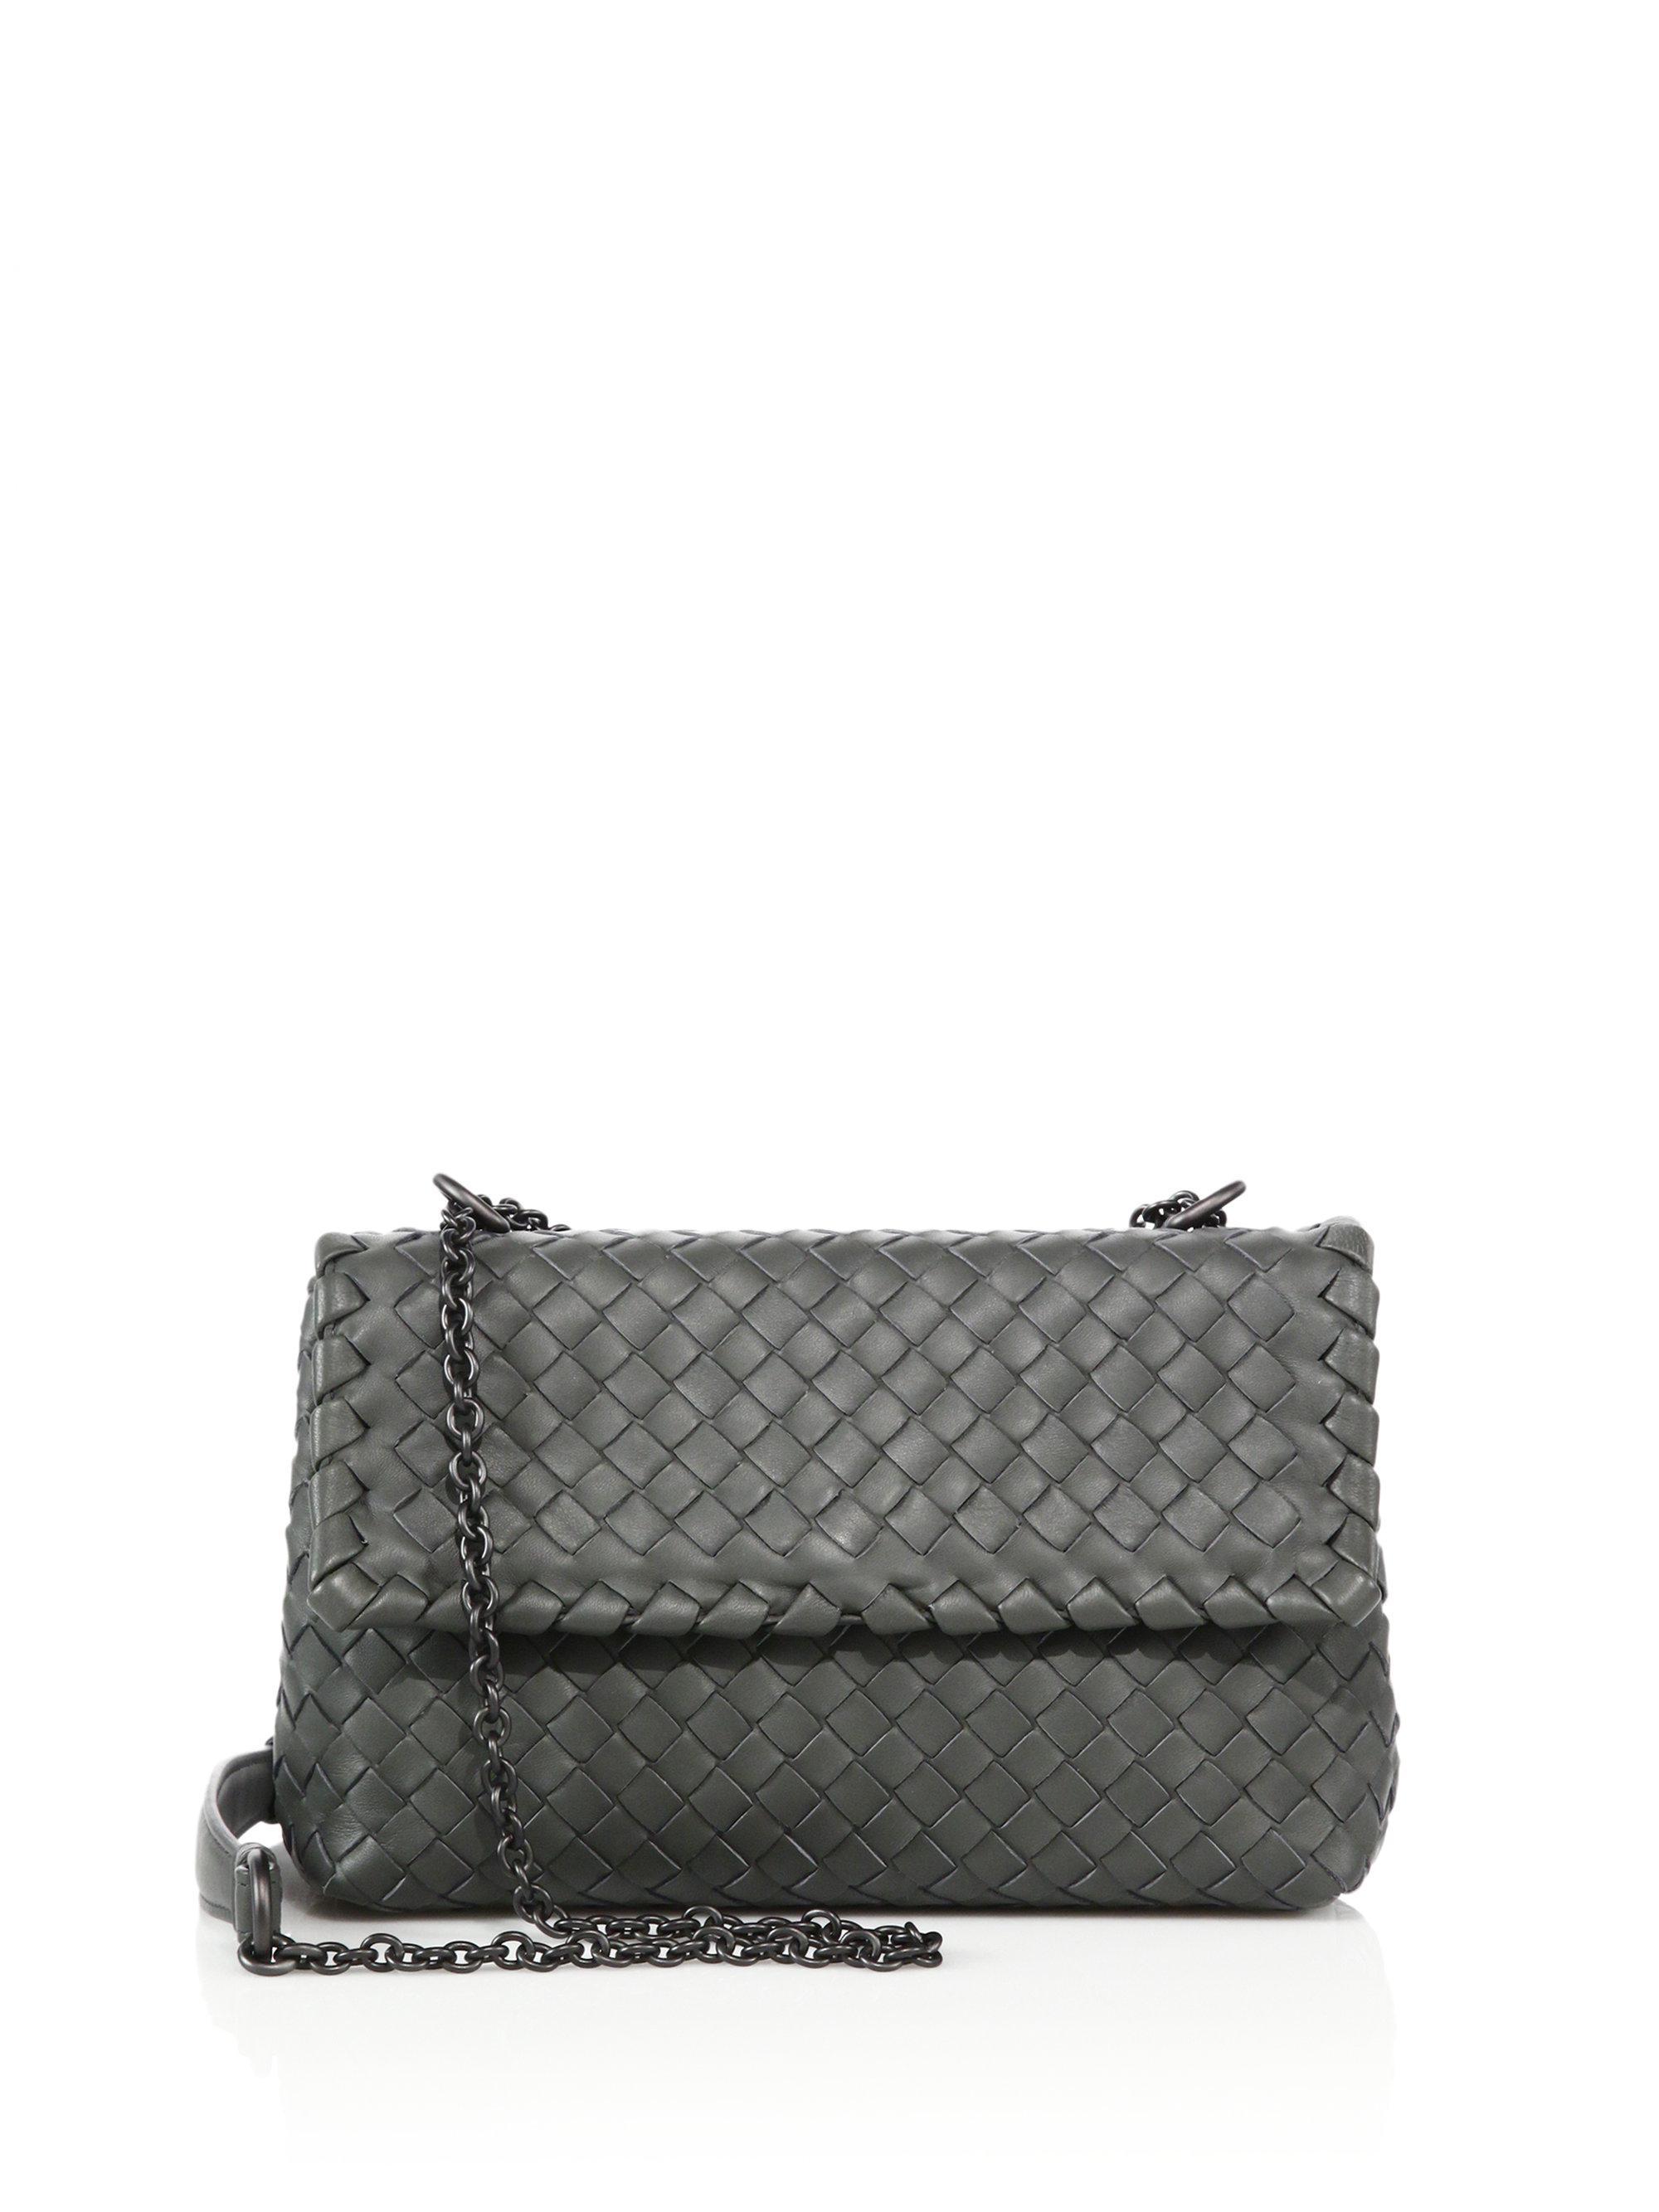 807a968be0 Bottega Veneta. Women s Gray Olimpia Medium Intrecciato Leather Cross-Body  Bag